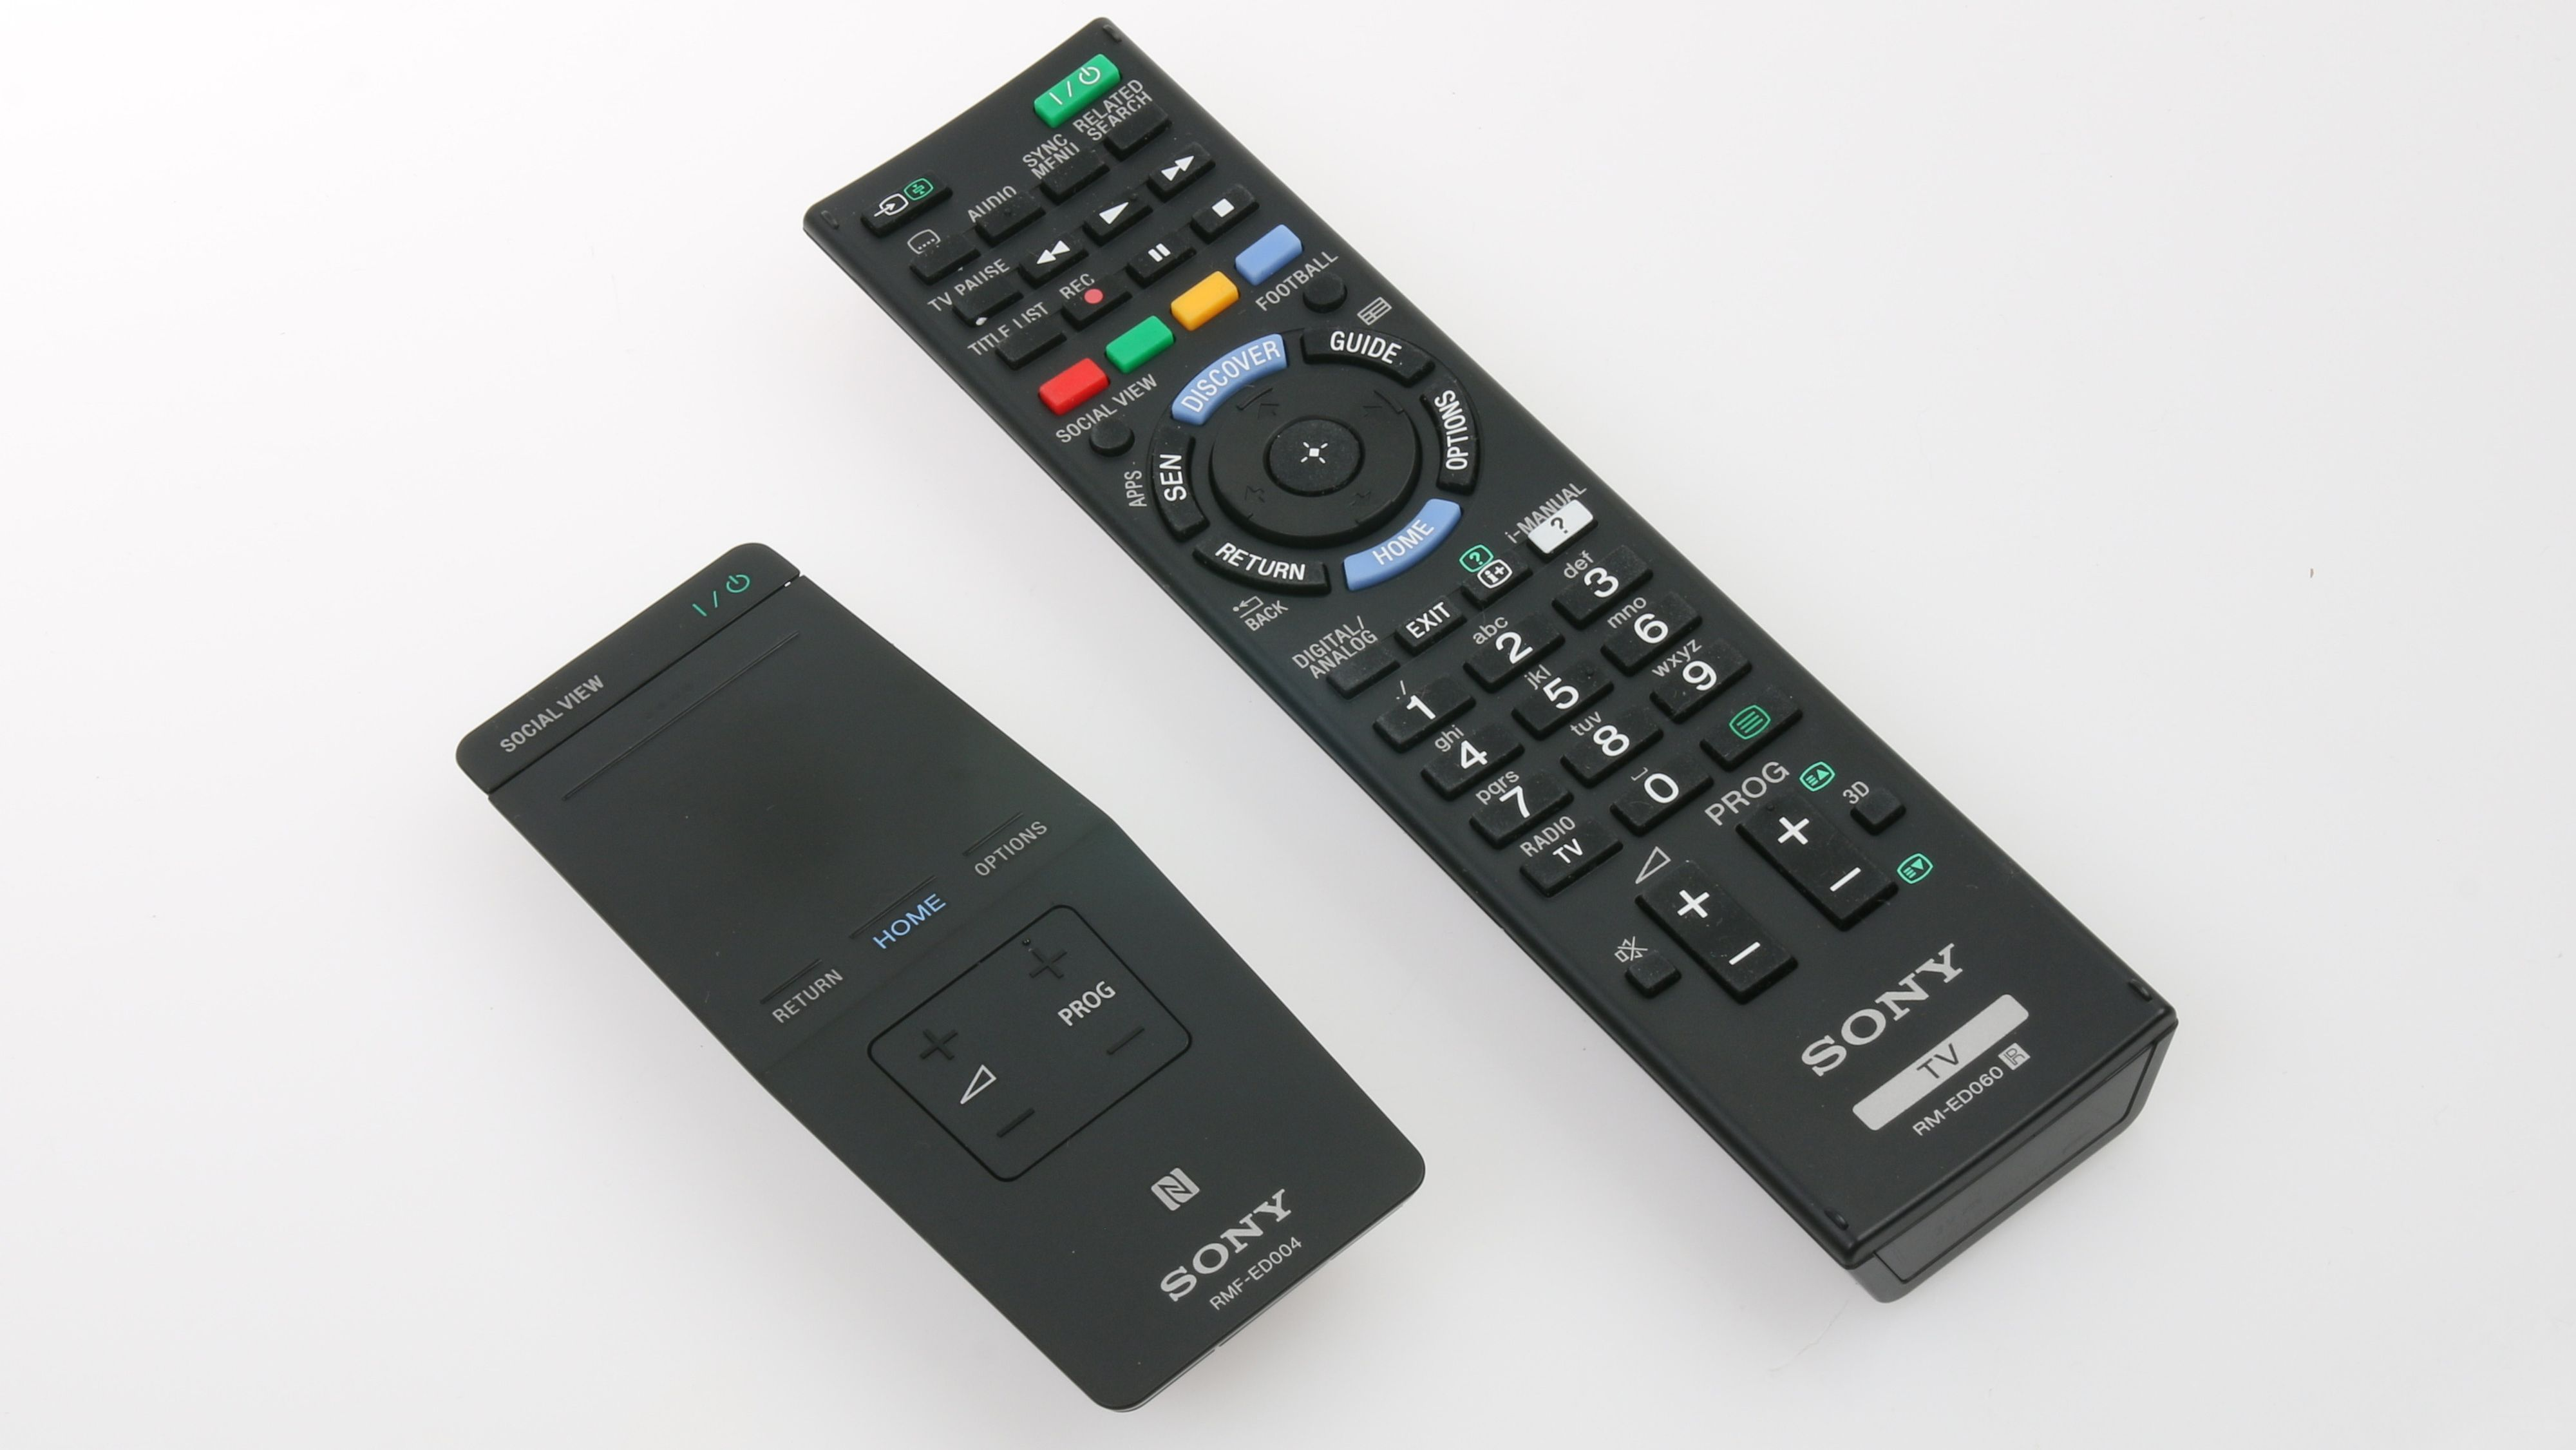 Det følger med to fjernkontroller. Modellen til venstre er smartkontrollen til Sony .Foto: Ole Henrik Johansen / Tek.no